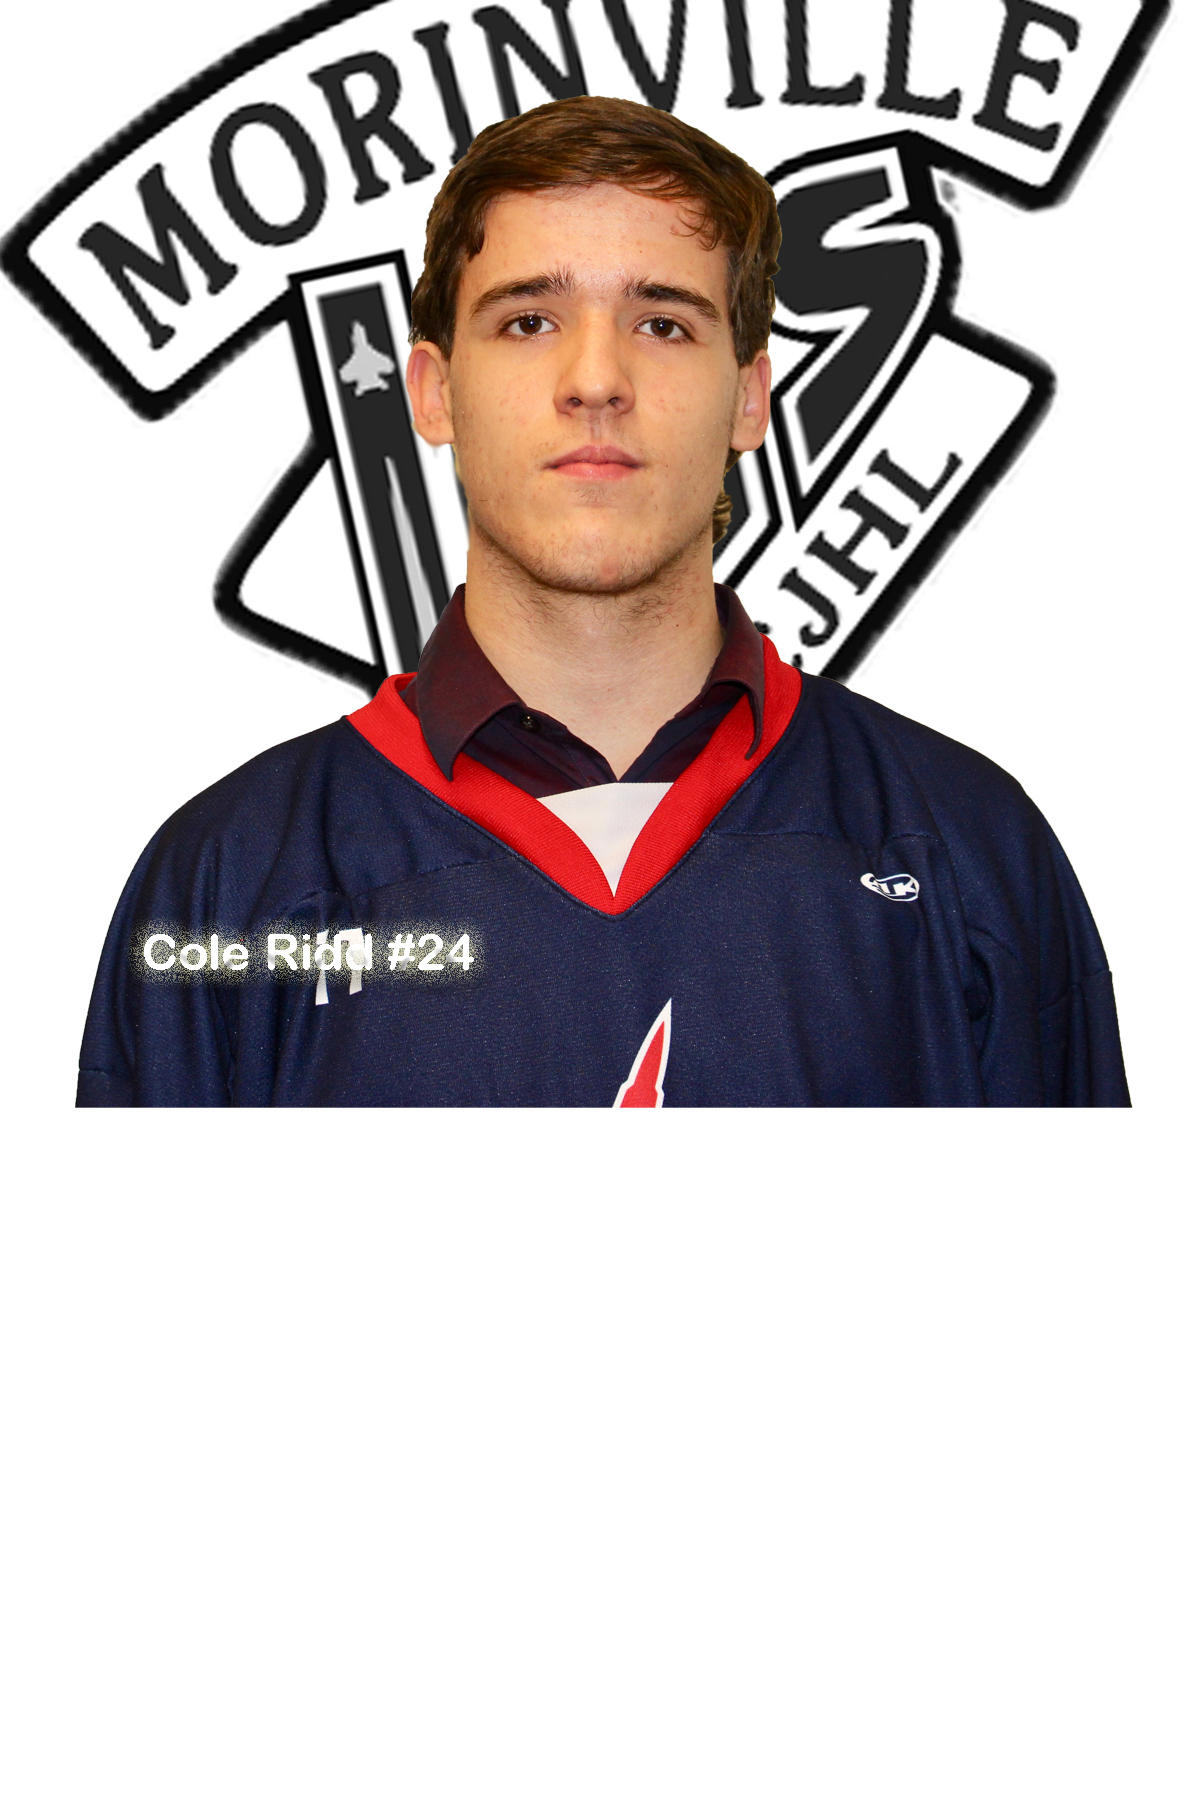 #24 Cole Ridd